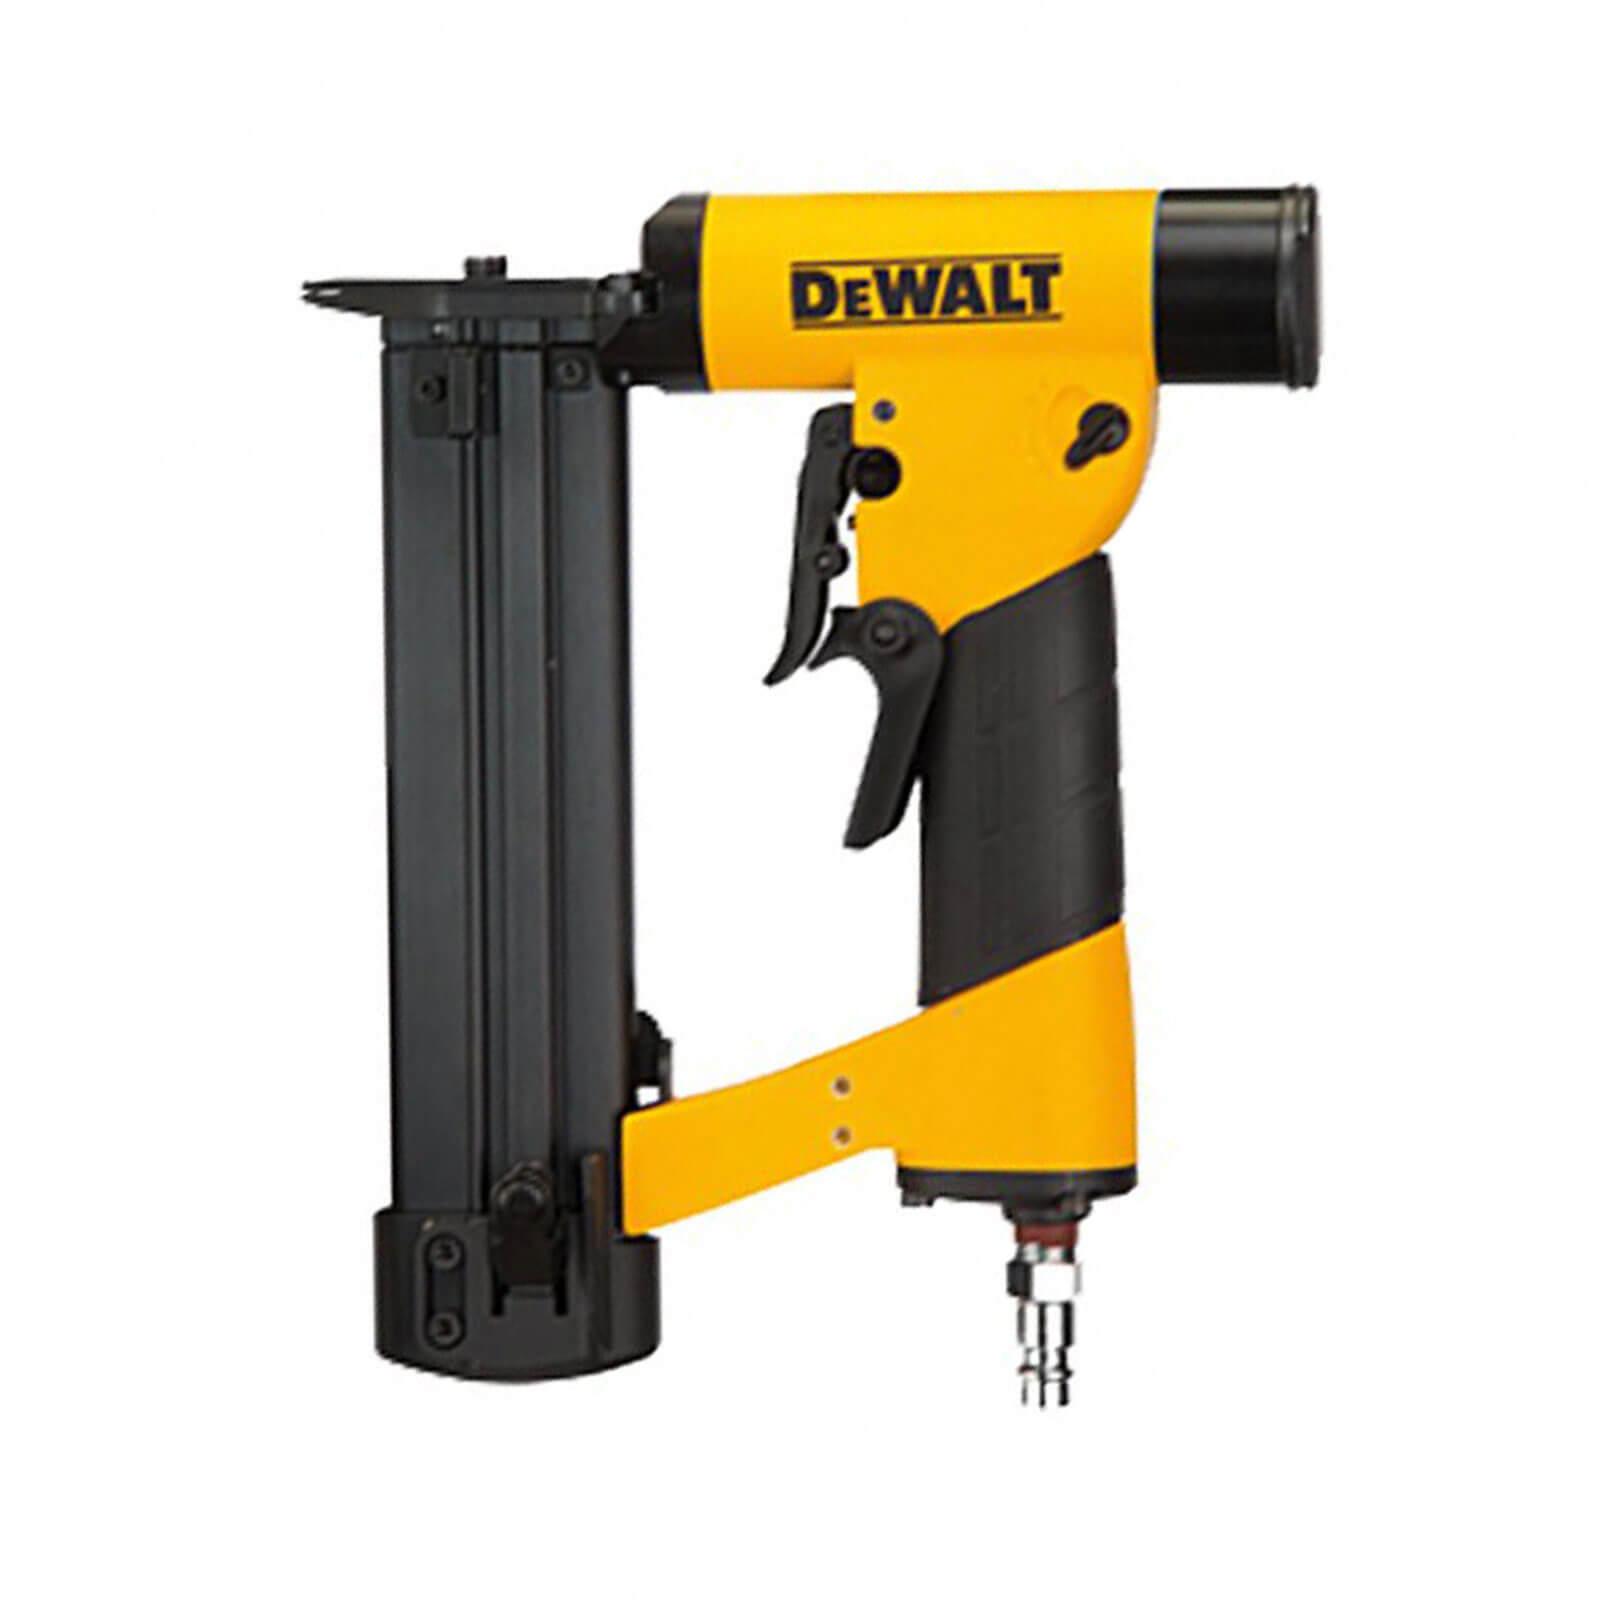 DeWalt DPN2330 23 Gauge Headless Pinner Air Nail Gun 10mm - 30mm